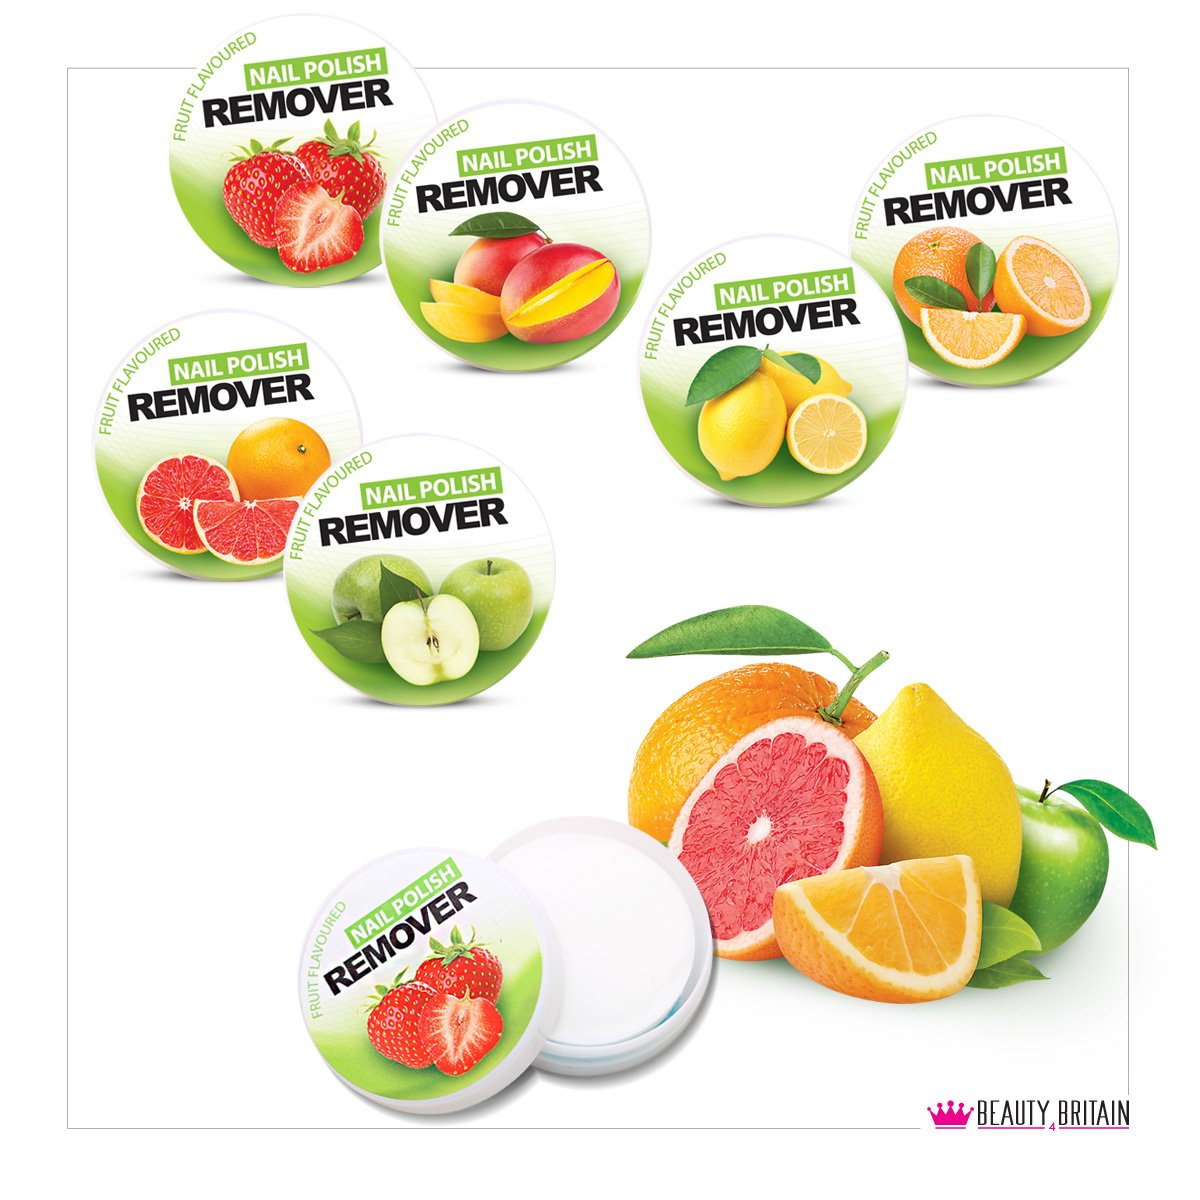 6 x Nail Polish Varnish Remover Tubes Acetone Free Fruity Scented UK Seller B4B